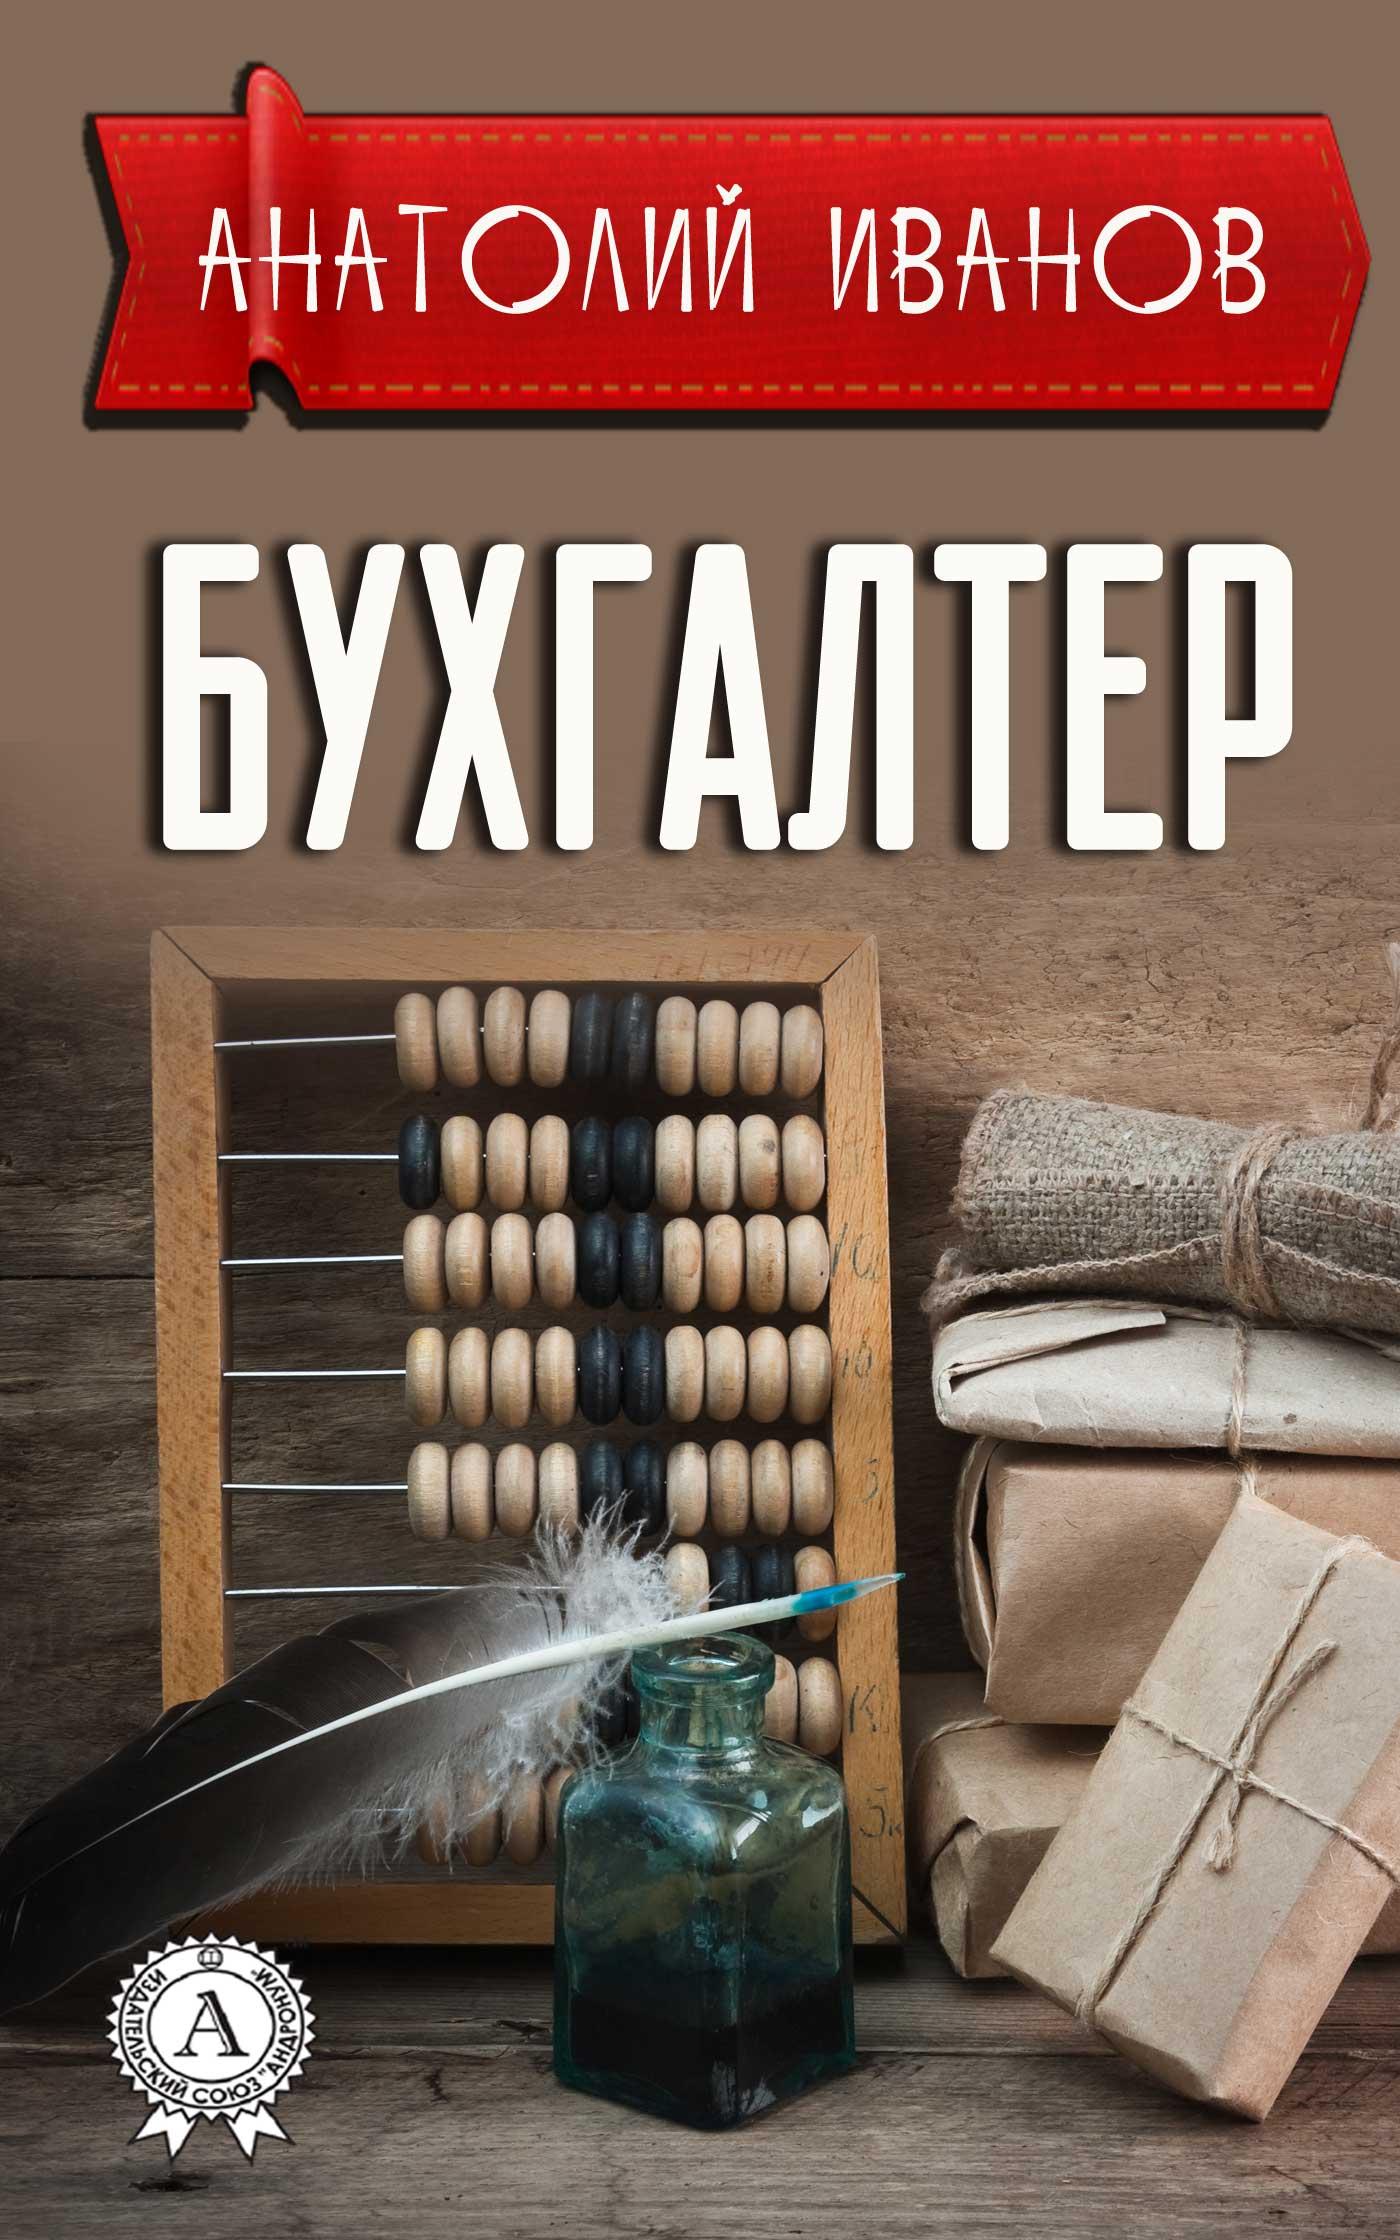 Анатолій Іванов Бухгалтер